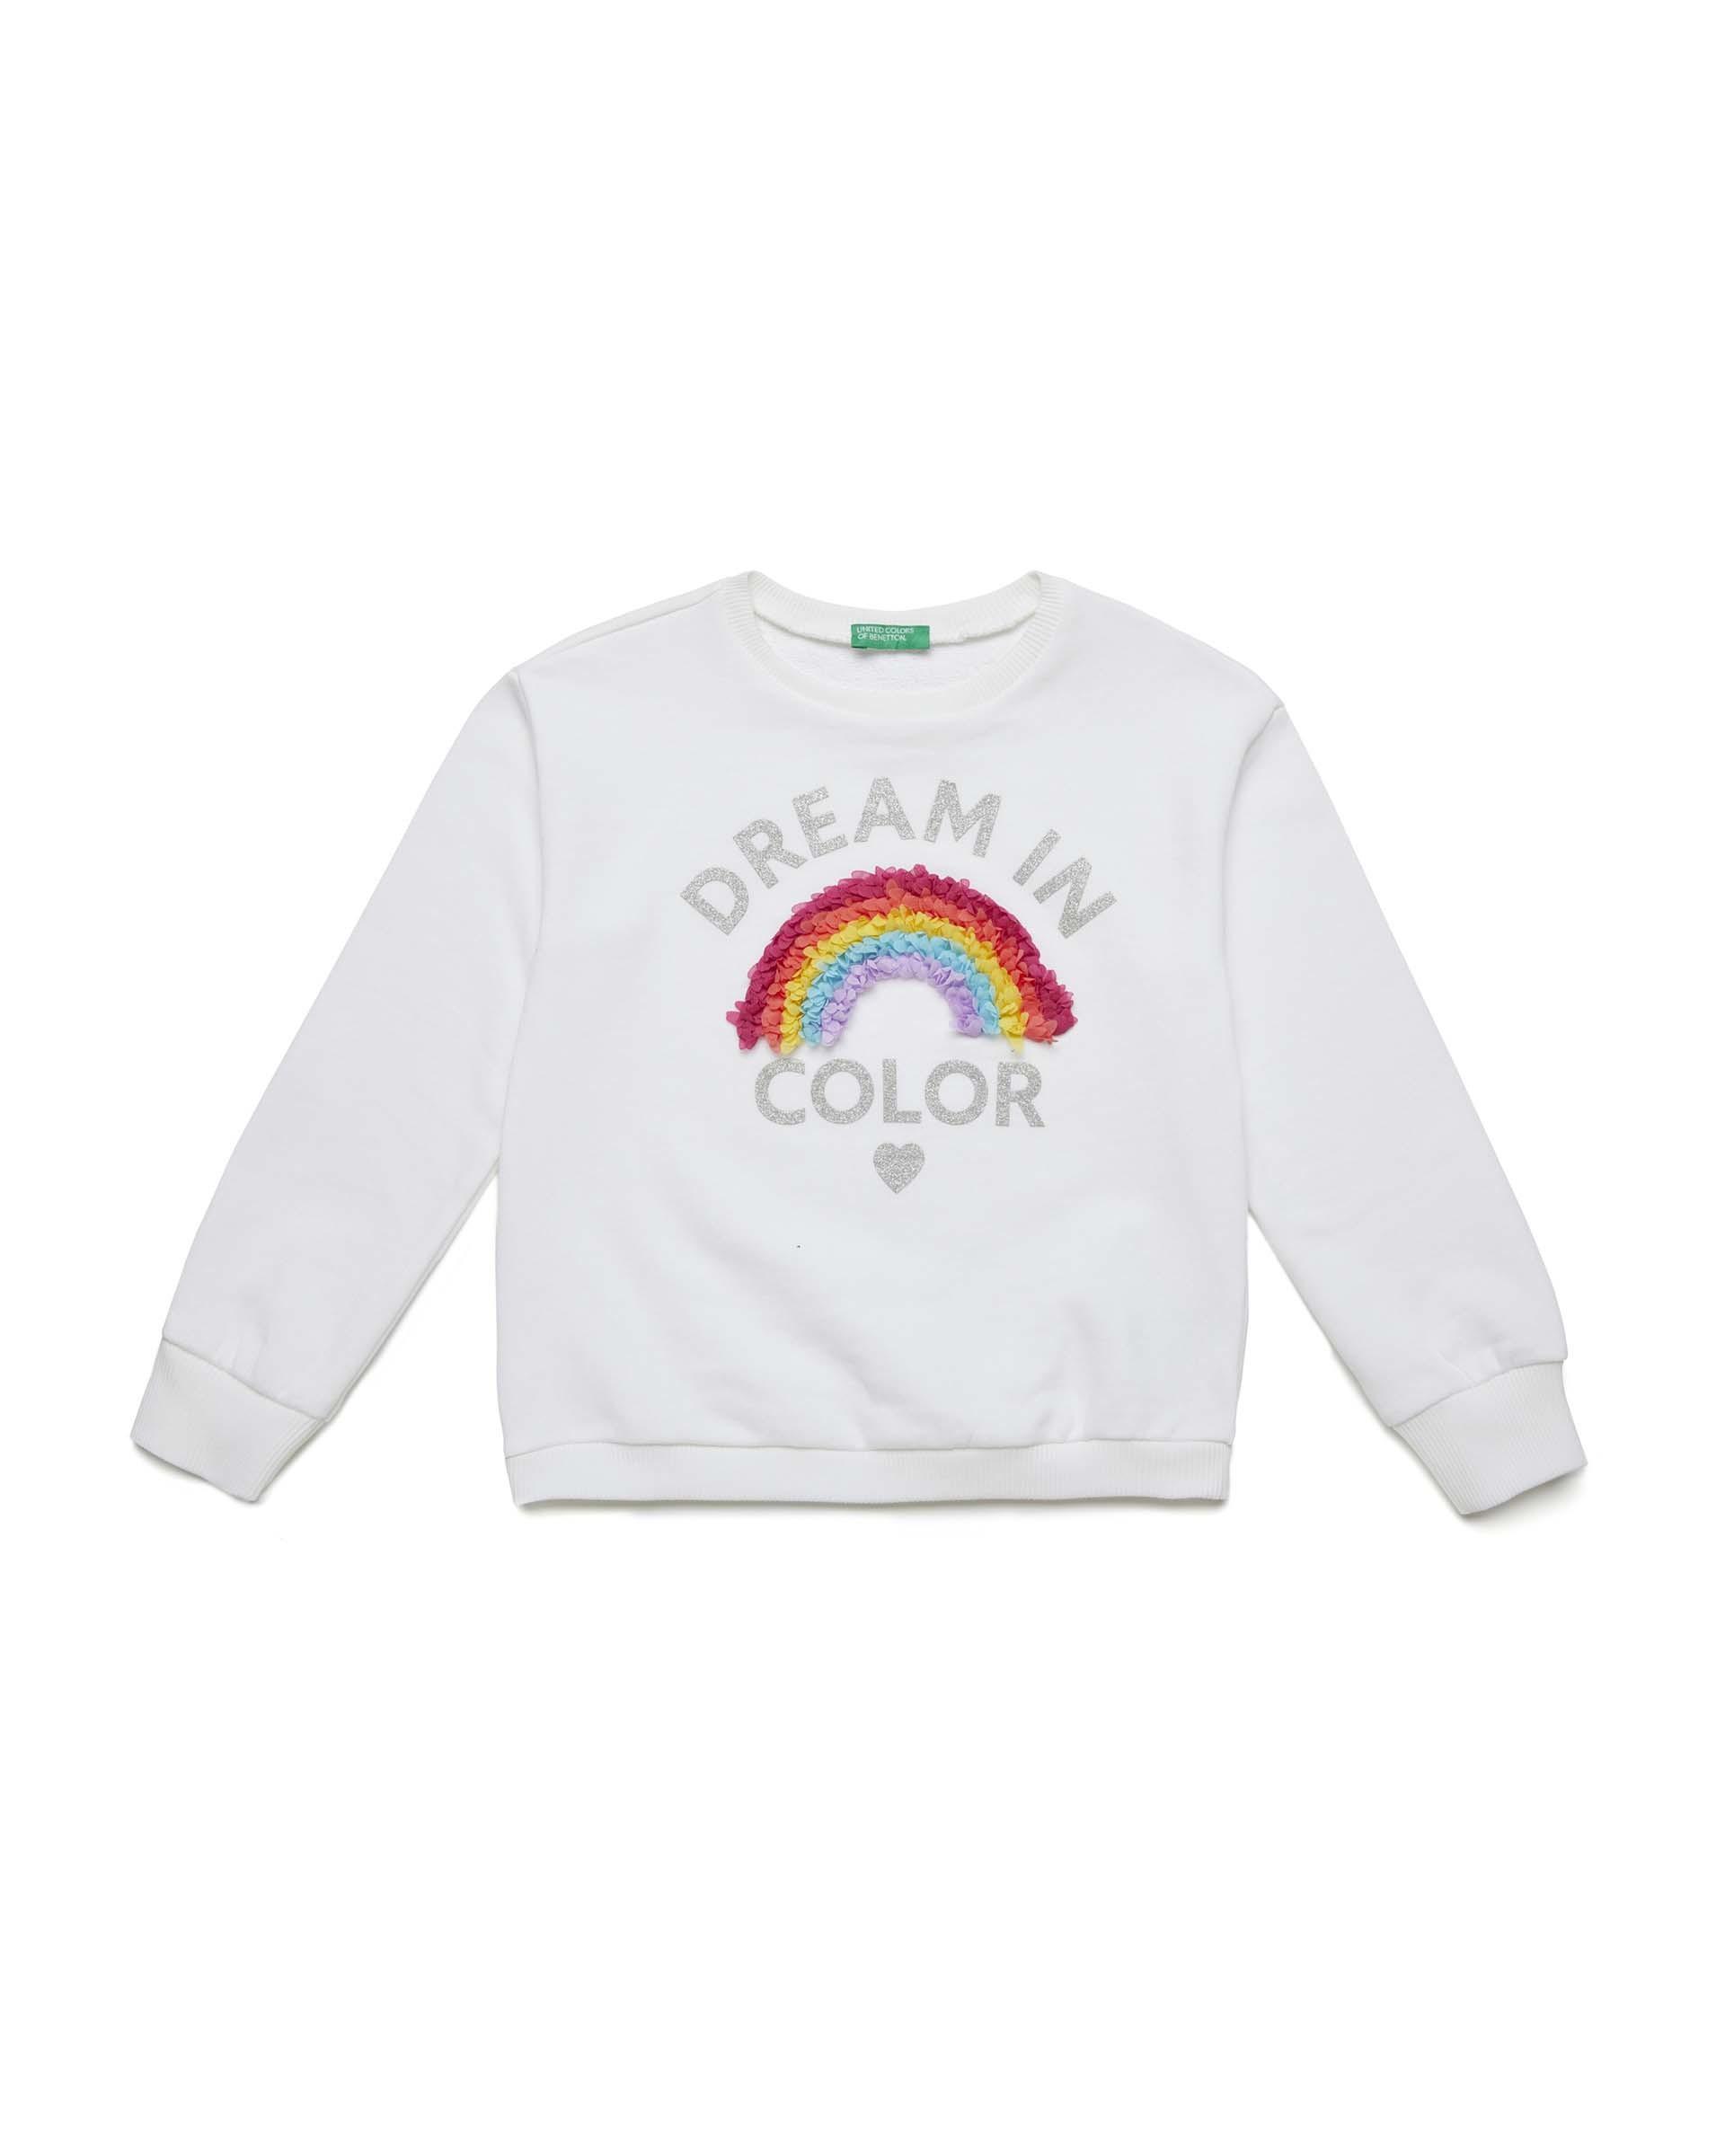 Купить 20P_3J68C14L2_101, Толстовка для девочек Benetton 3J68C14L2_101 р-р 140, United Colors of Benetton, Толстовки для девочек